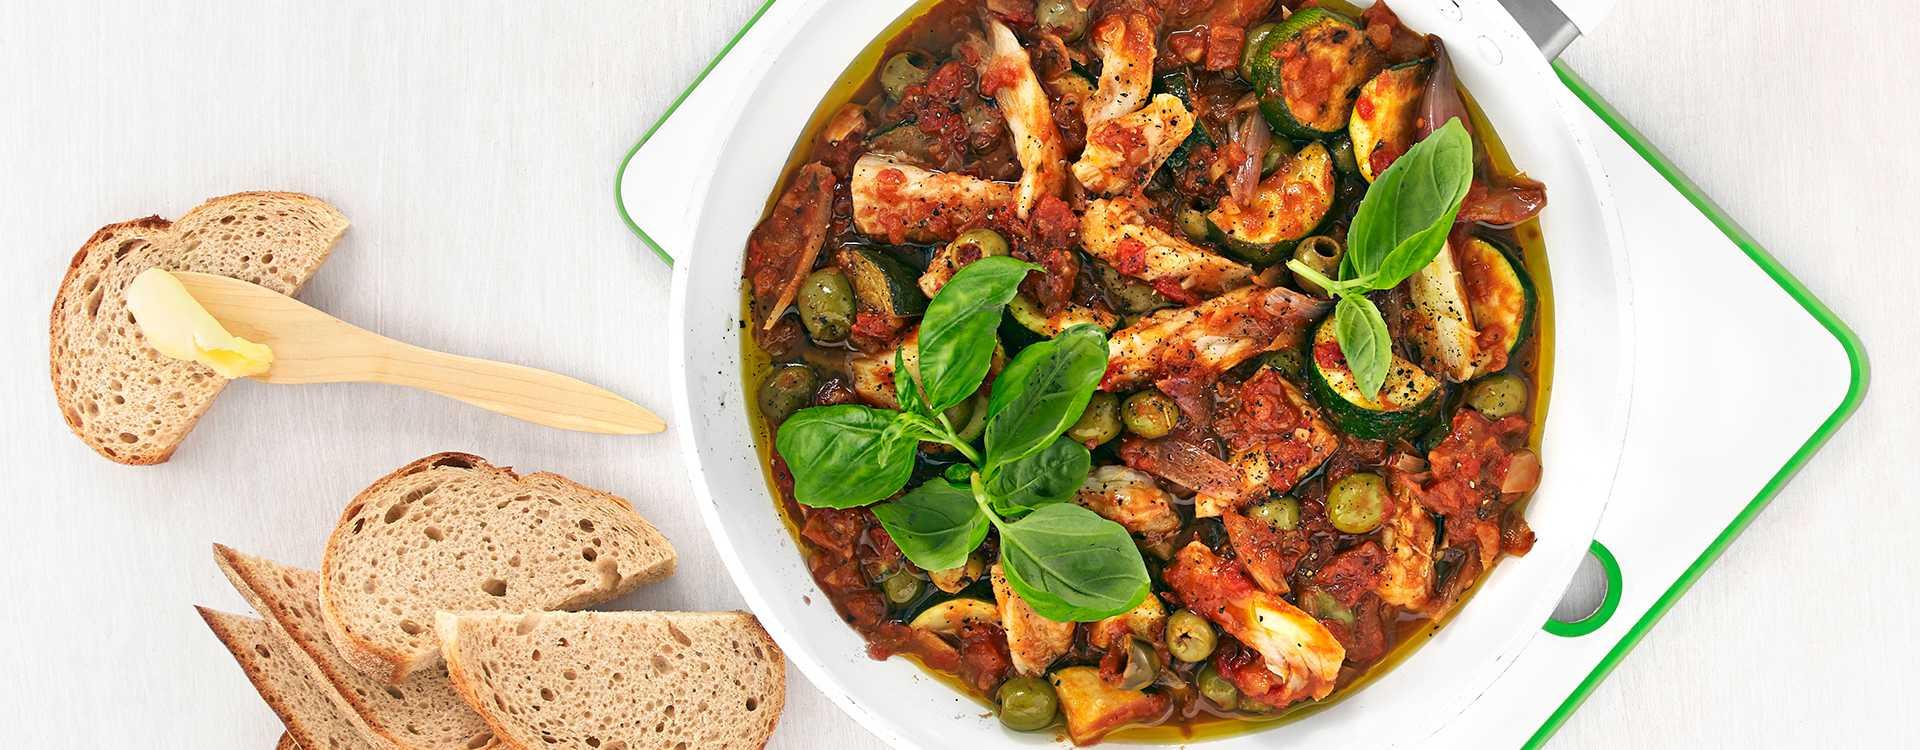 Klippfisk i panne med squash, aubergine og oliven